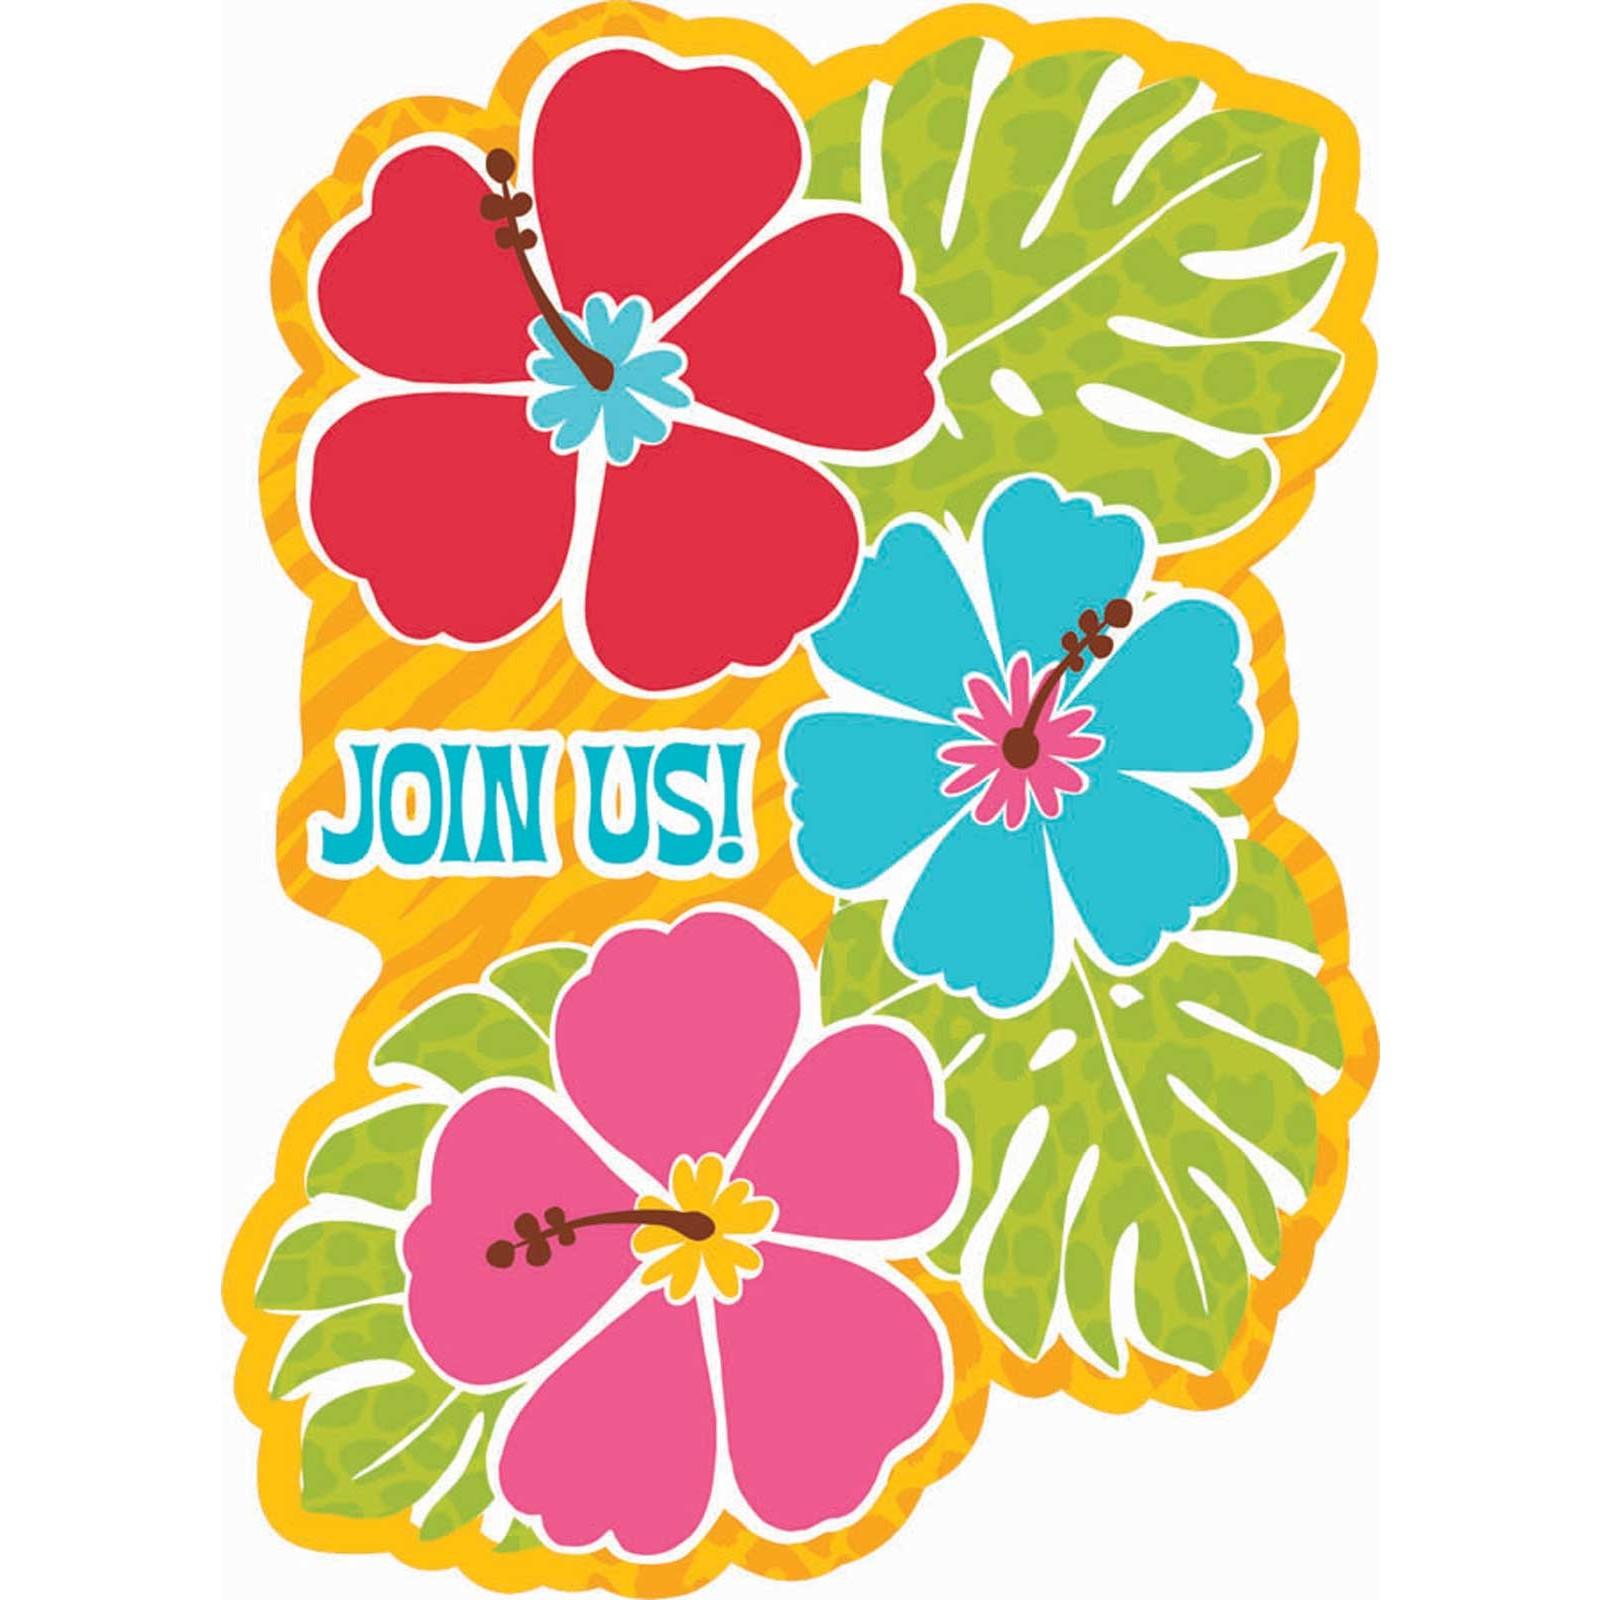 Hawaiian luau party clipart png royalty free stock Luau Clipart | Free download best Luau Clipart on ClipArtMag.com png royalty free stock